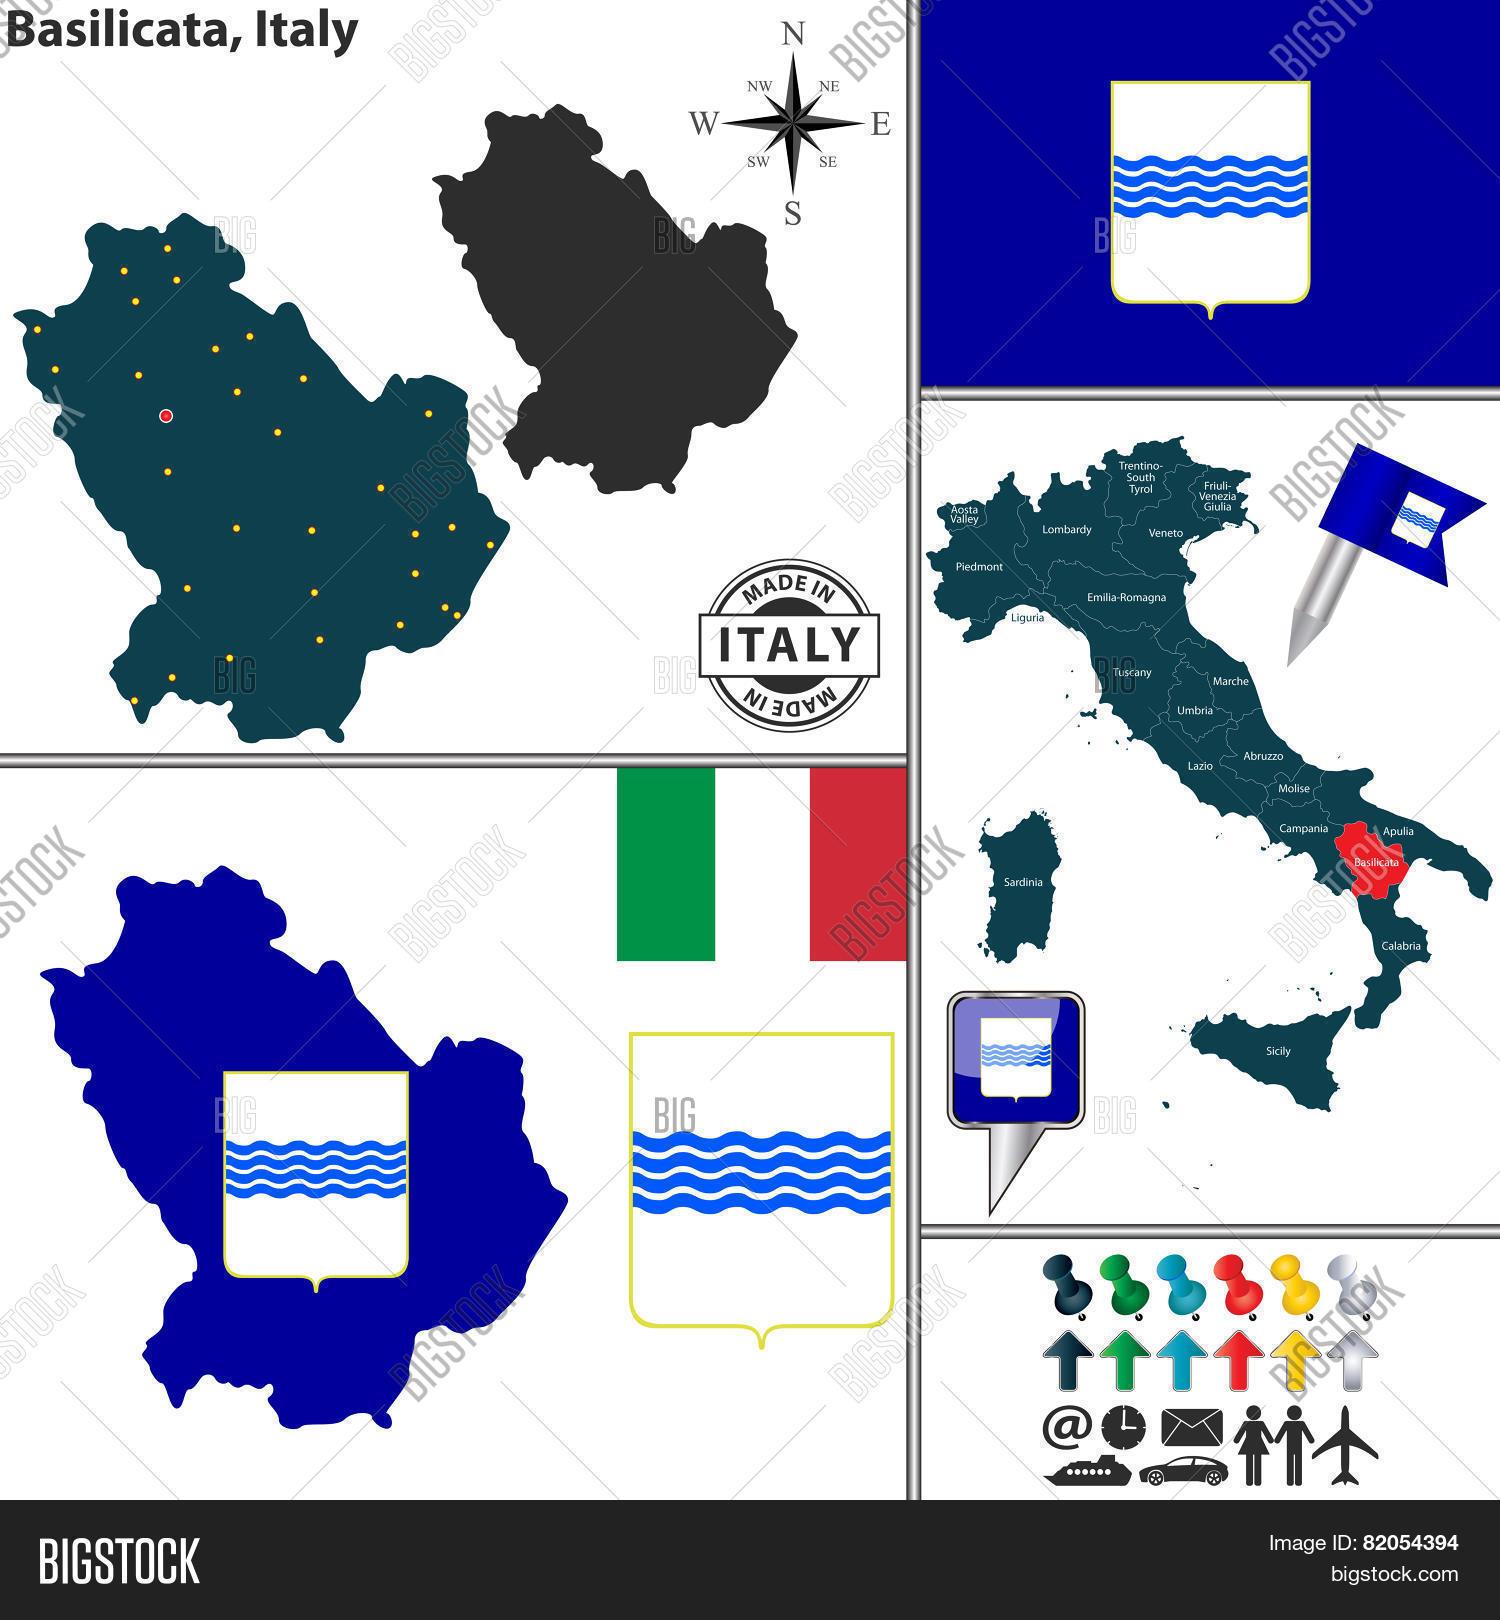 Map Basilicata Italy Vector Photo Free Trial Bigstock